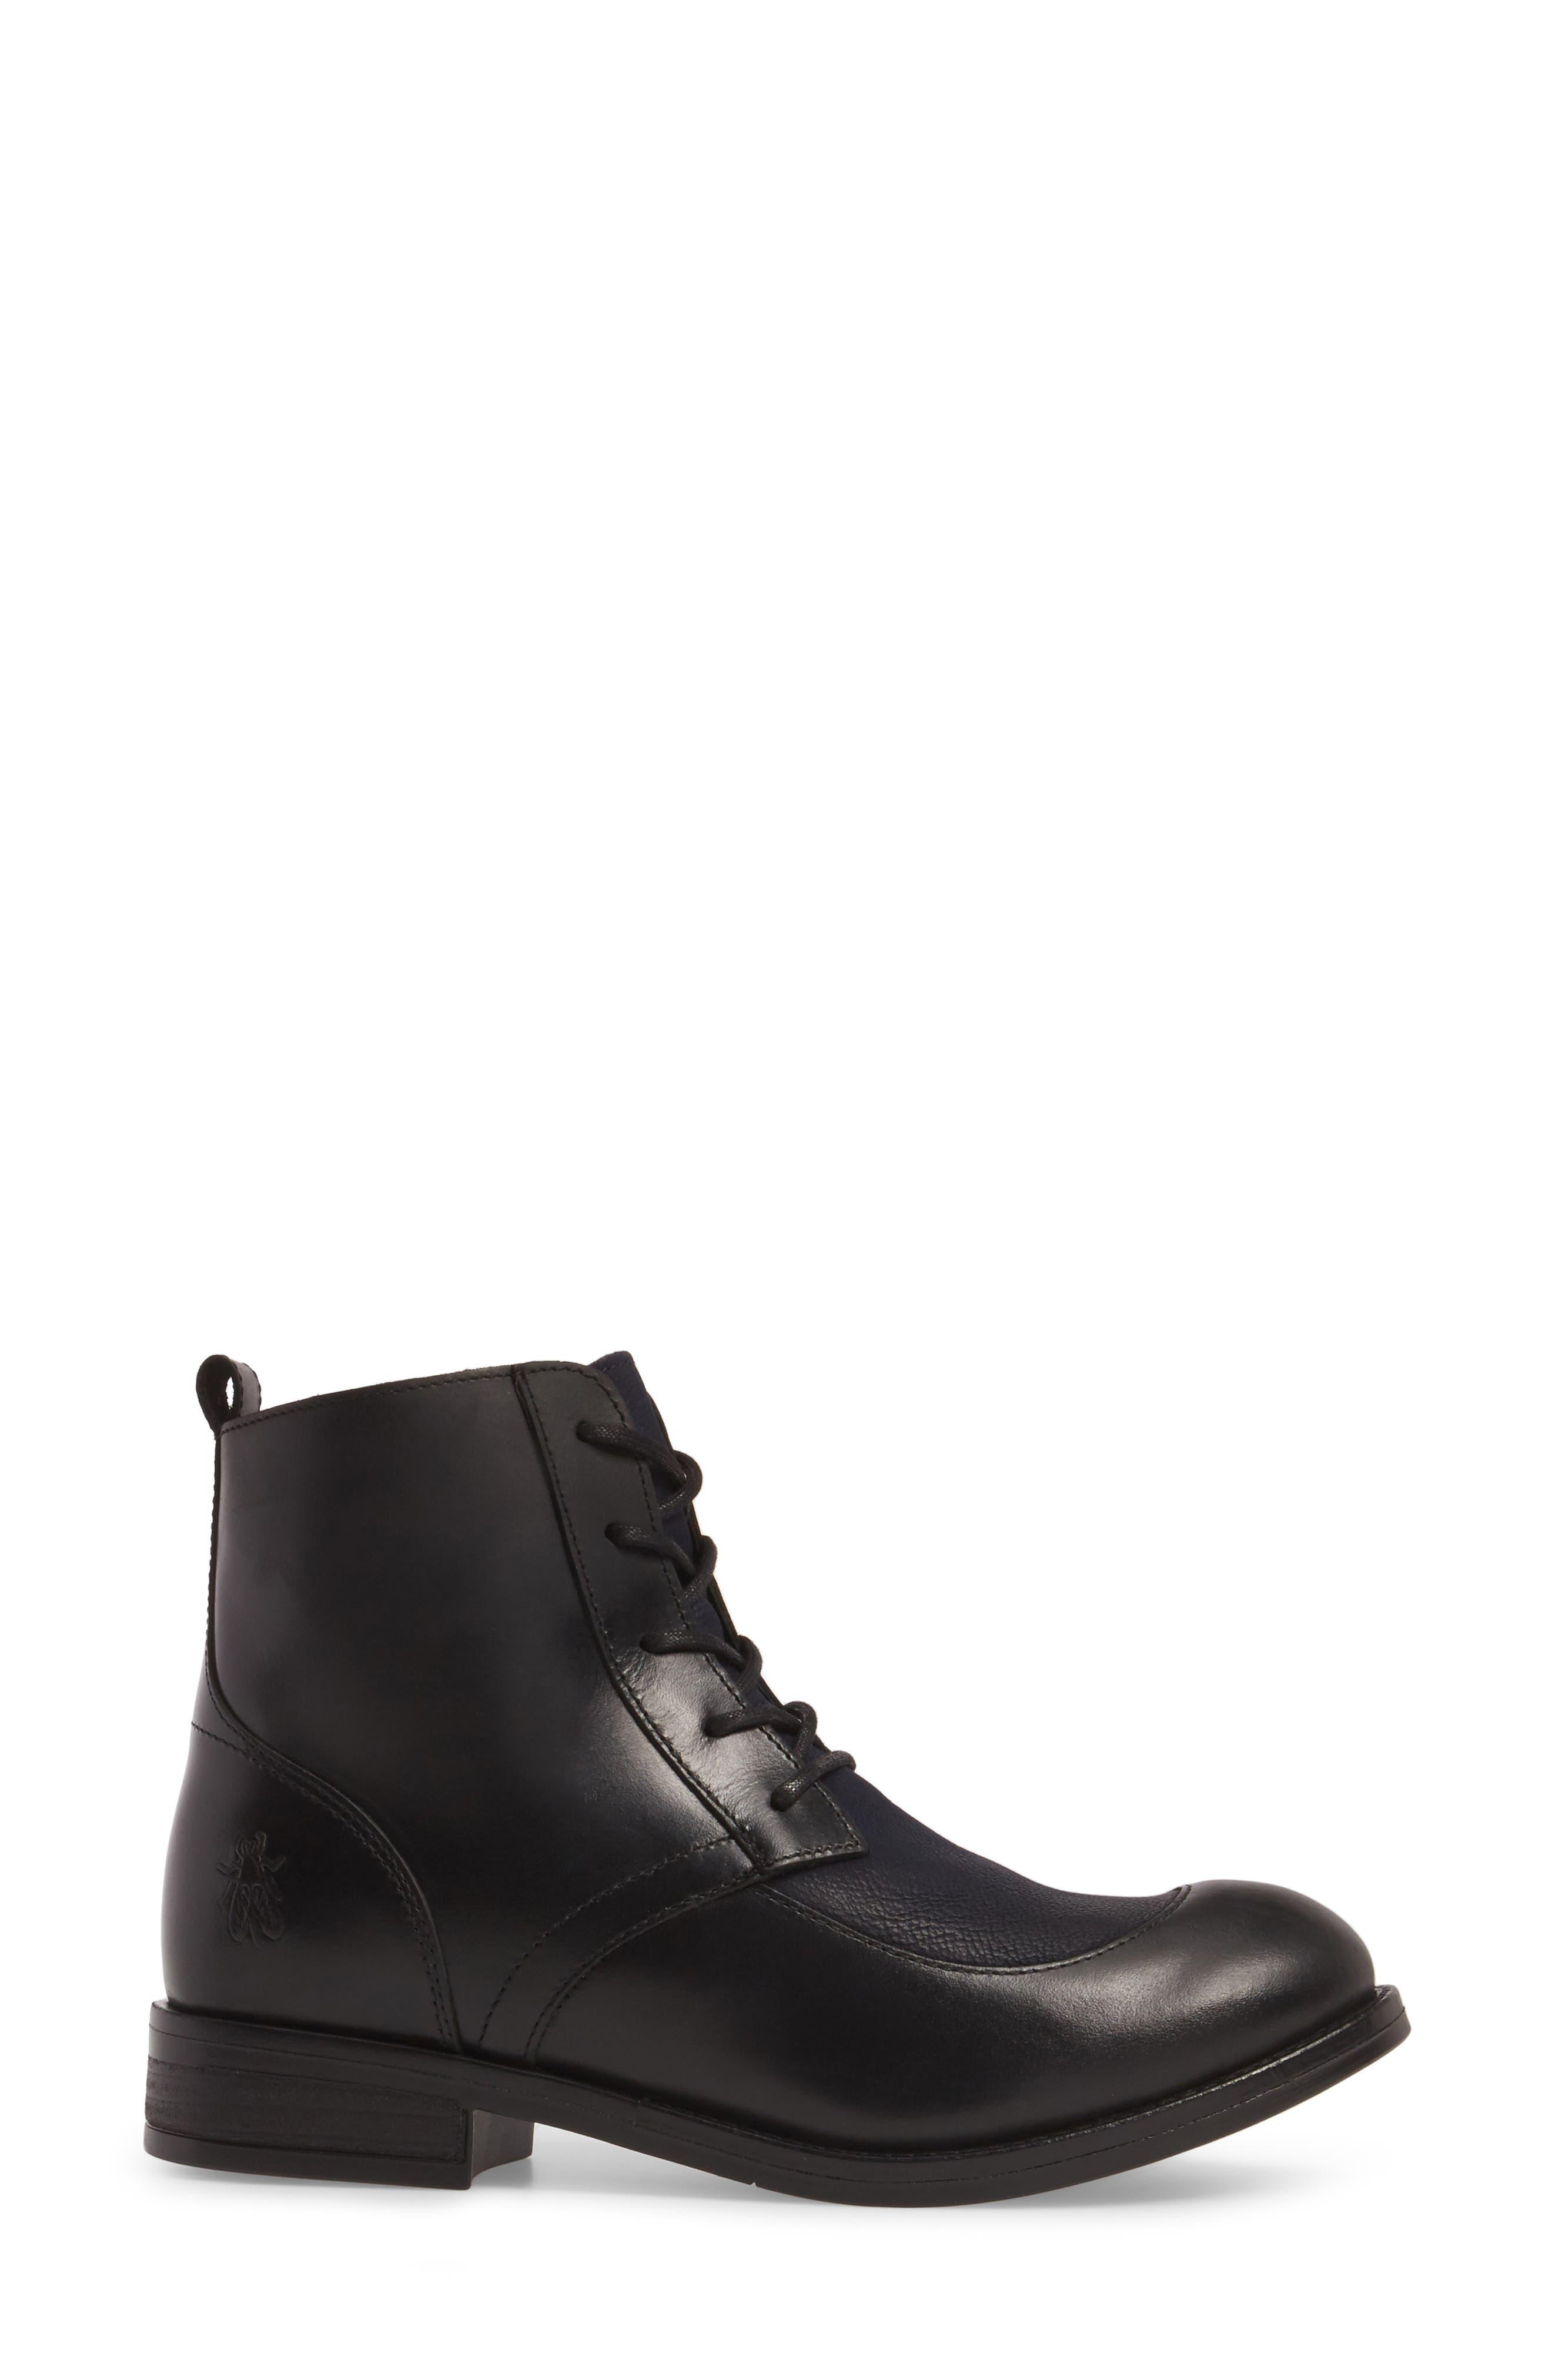 Arty Boot,                             Alternate thumbnail 3, color,                             Black/ Ocean Leather